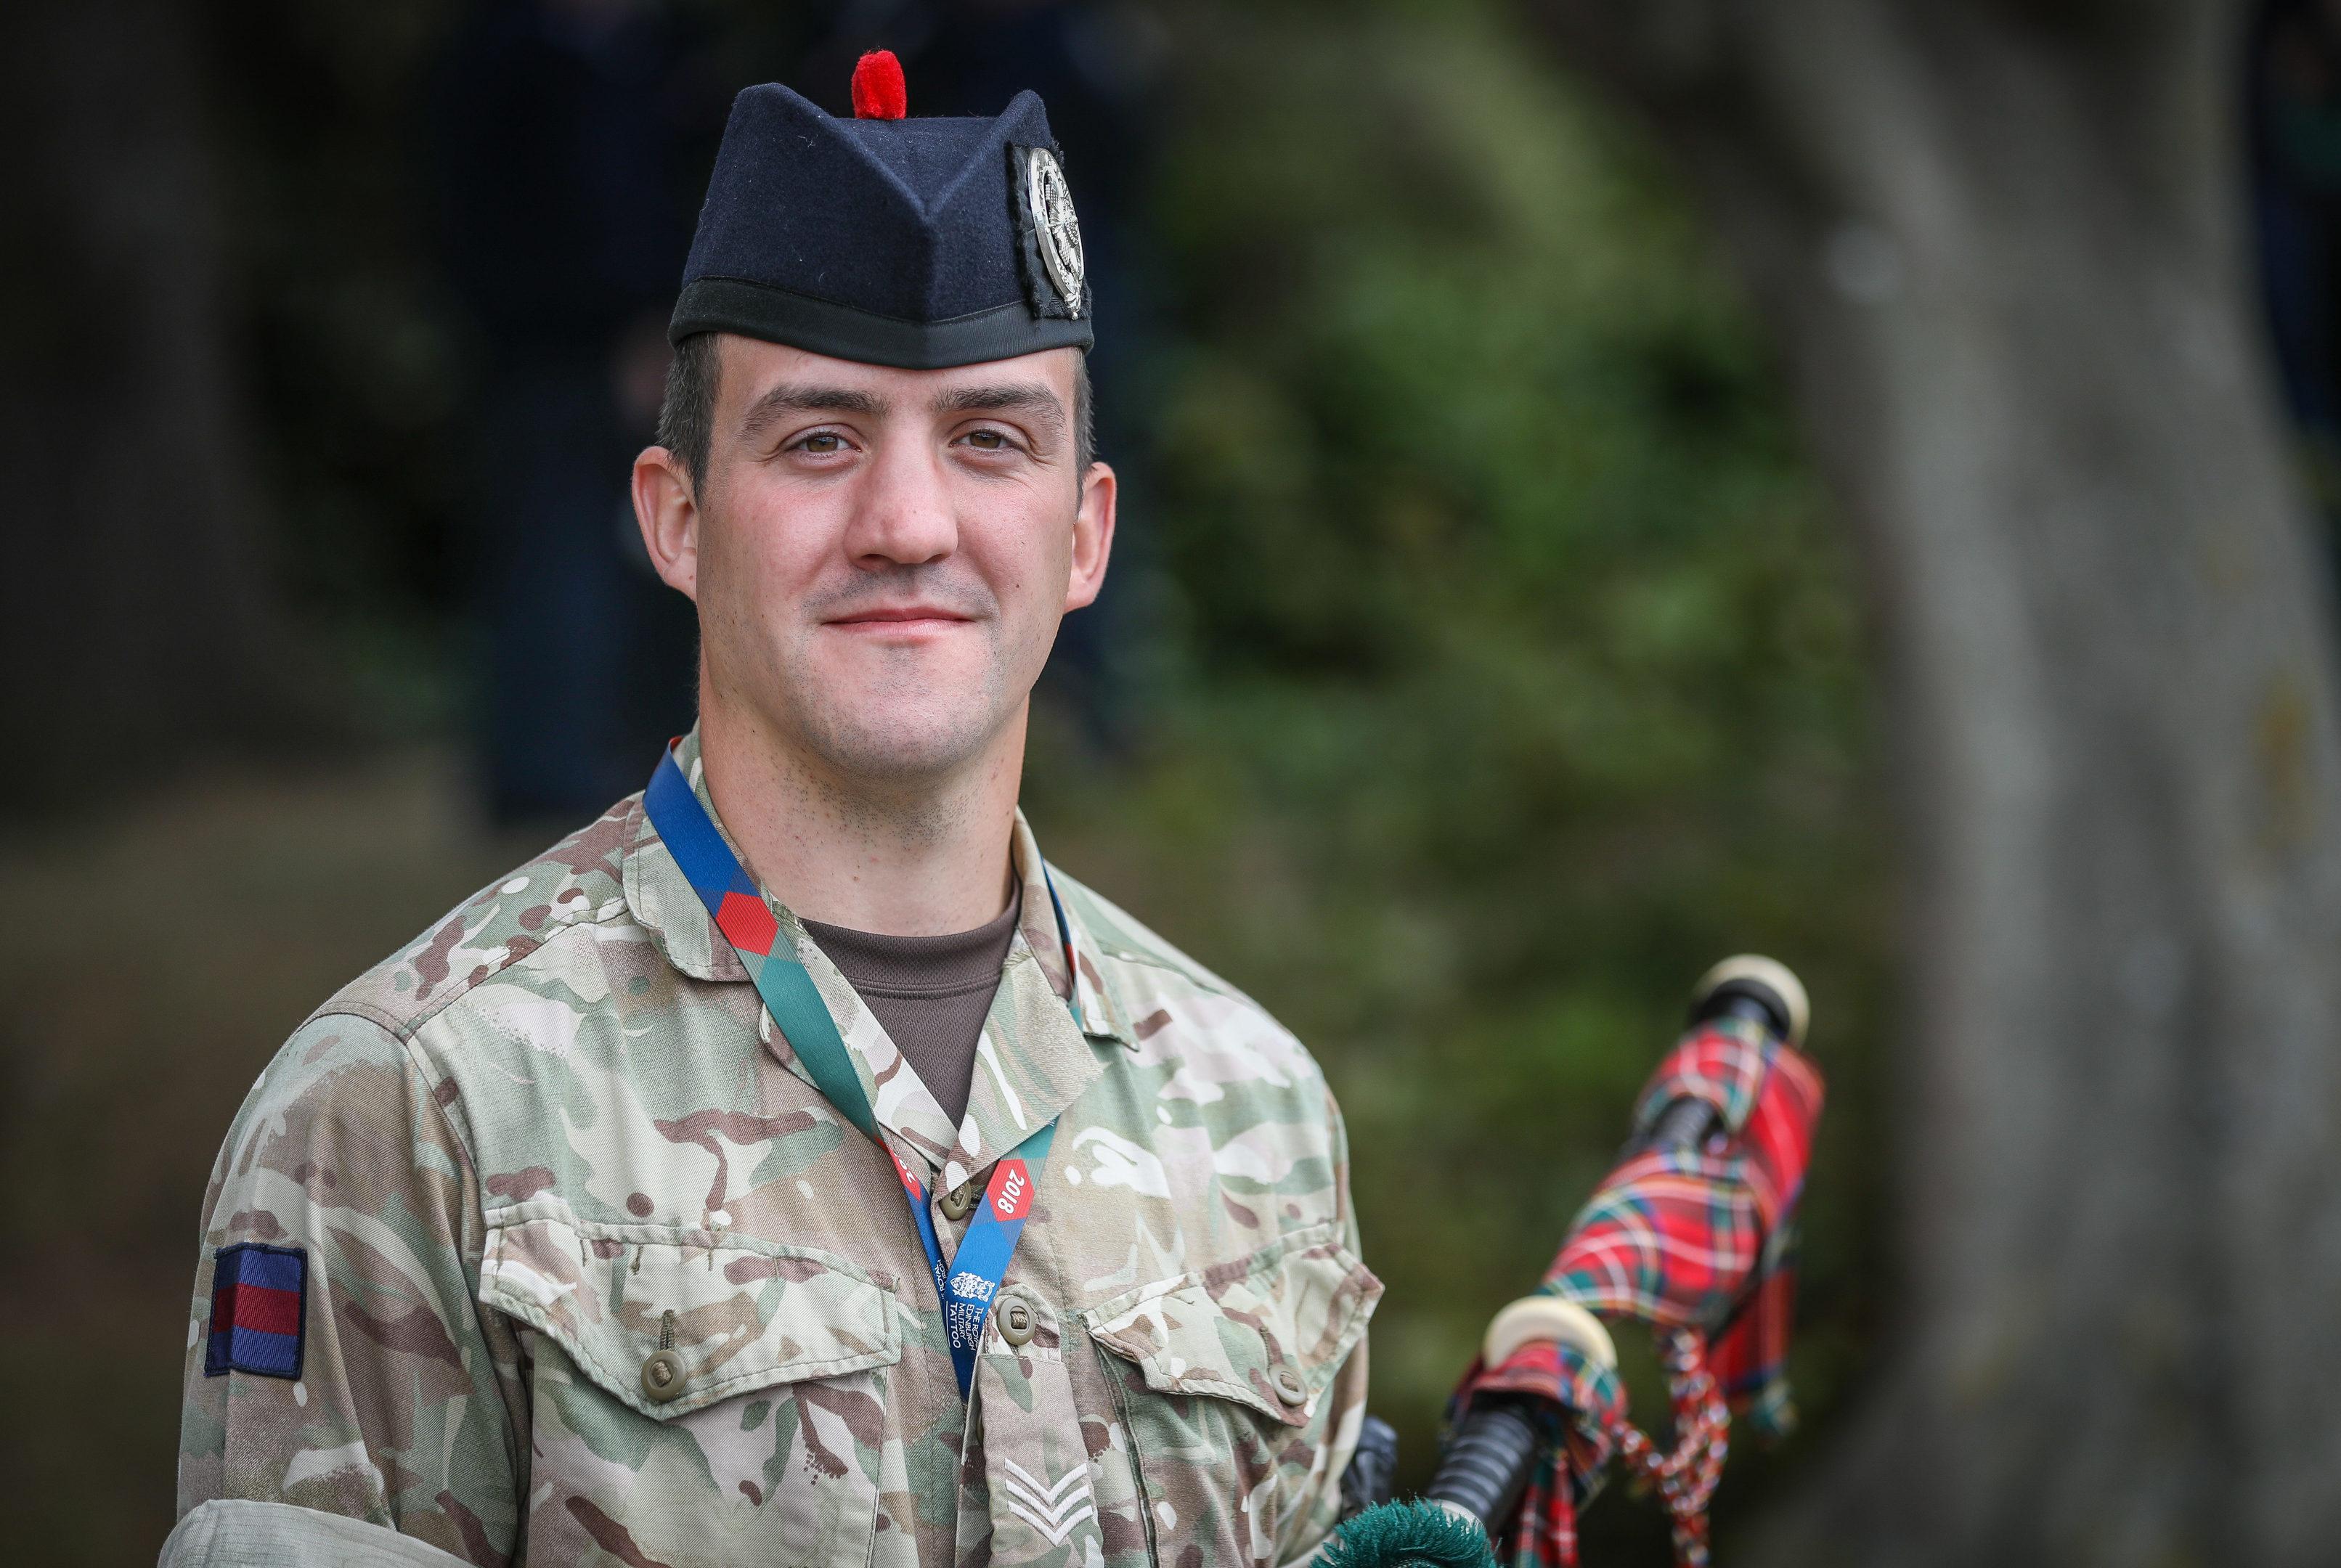 Lance Sergeant John Mitchell of Dundee